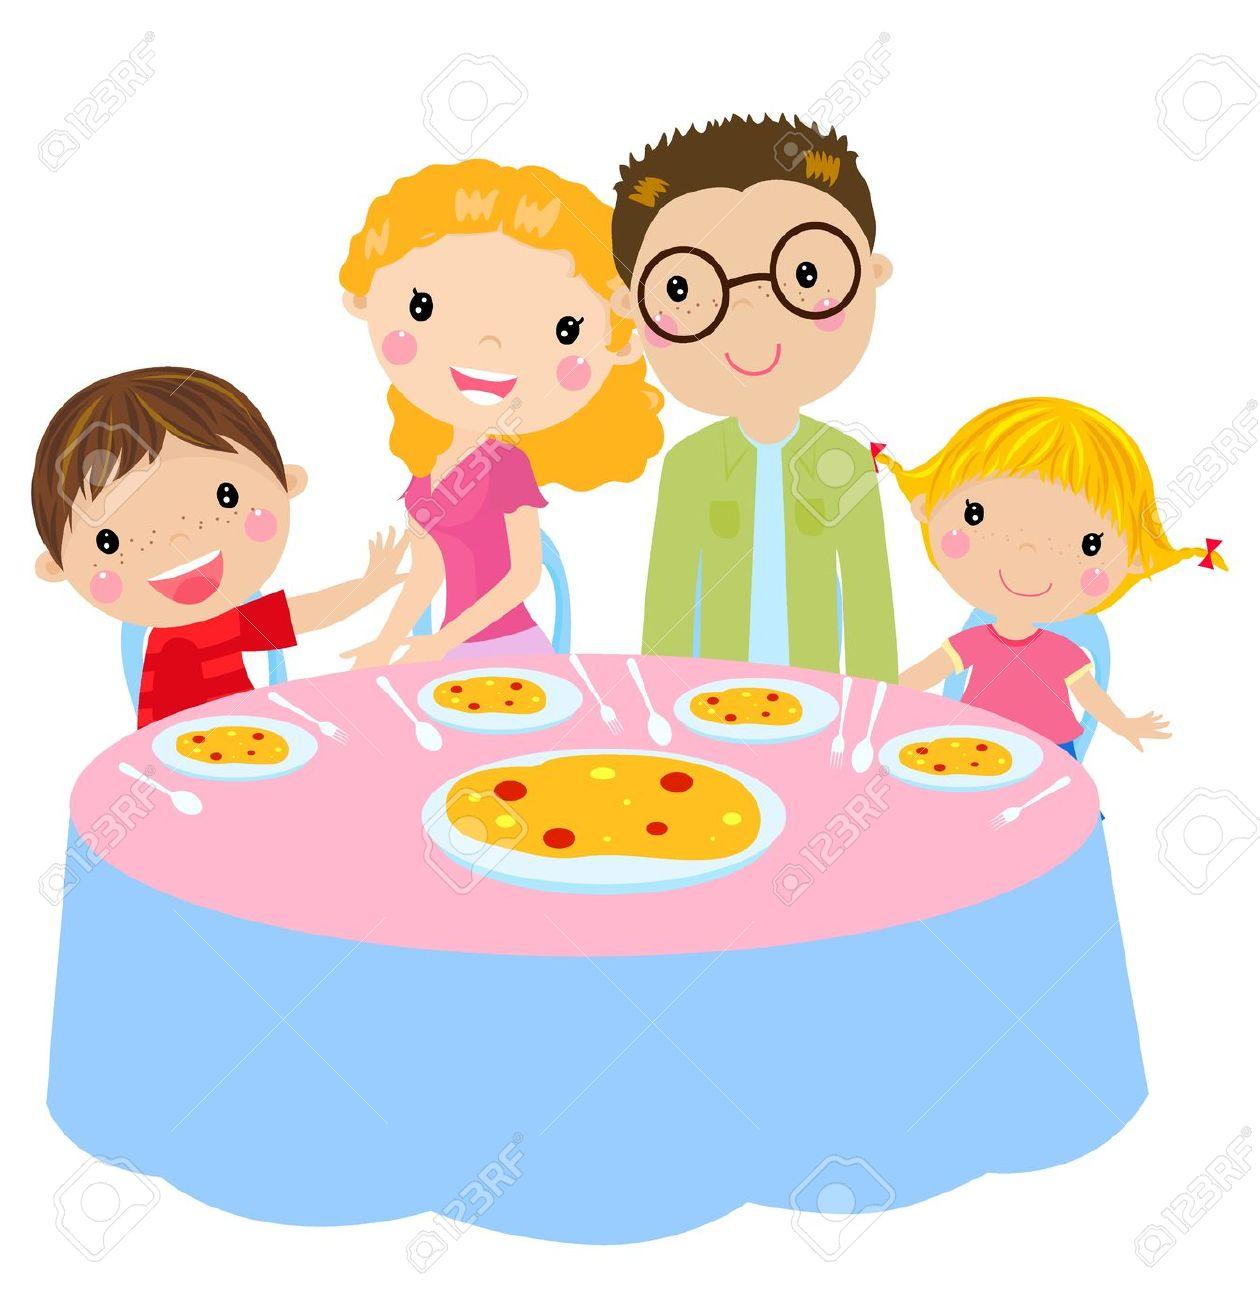 Family Dinner Table: Family .-family dinner table: family .-4